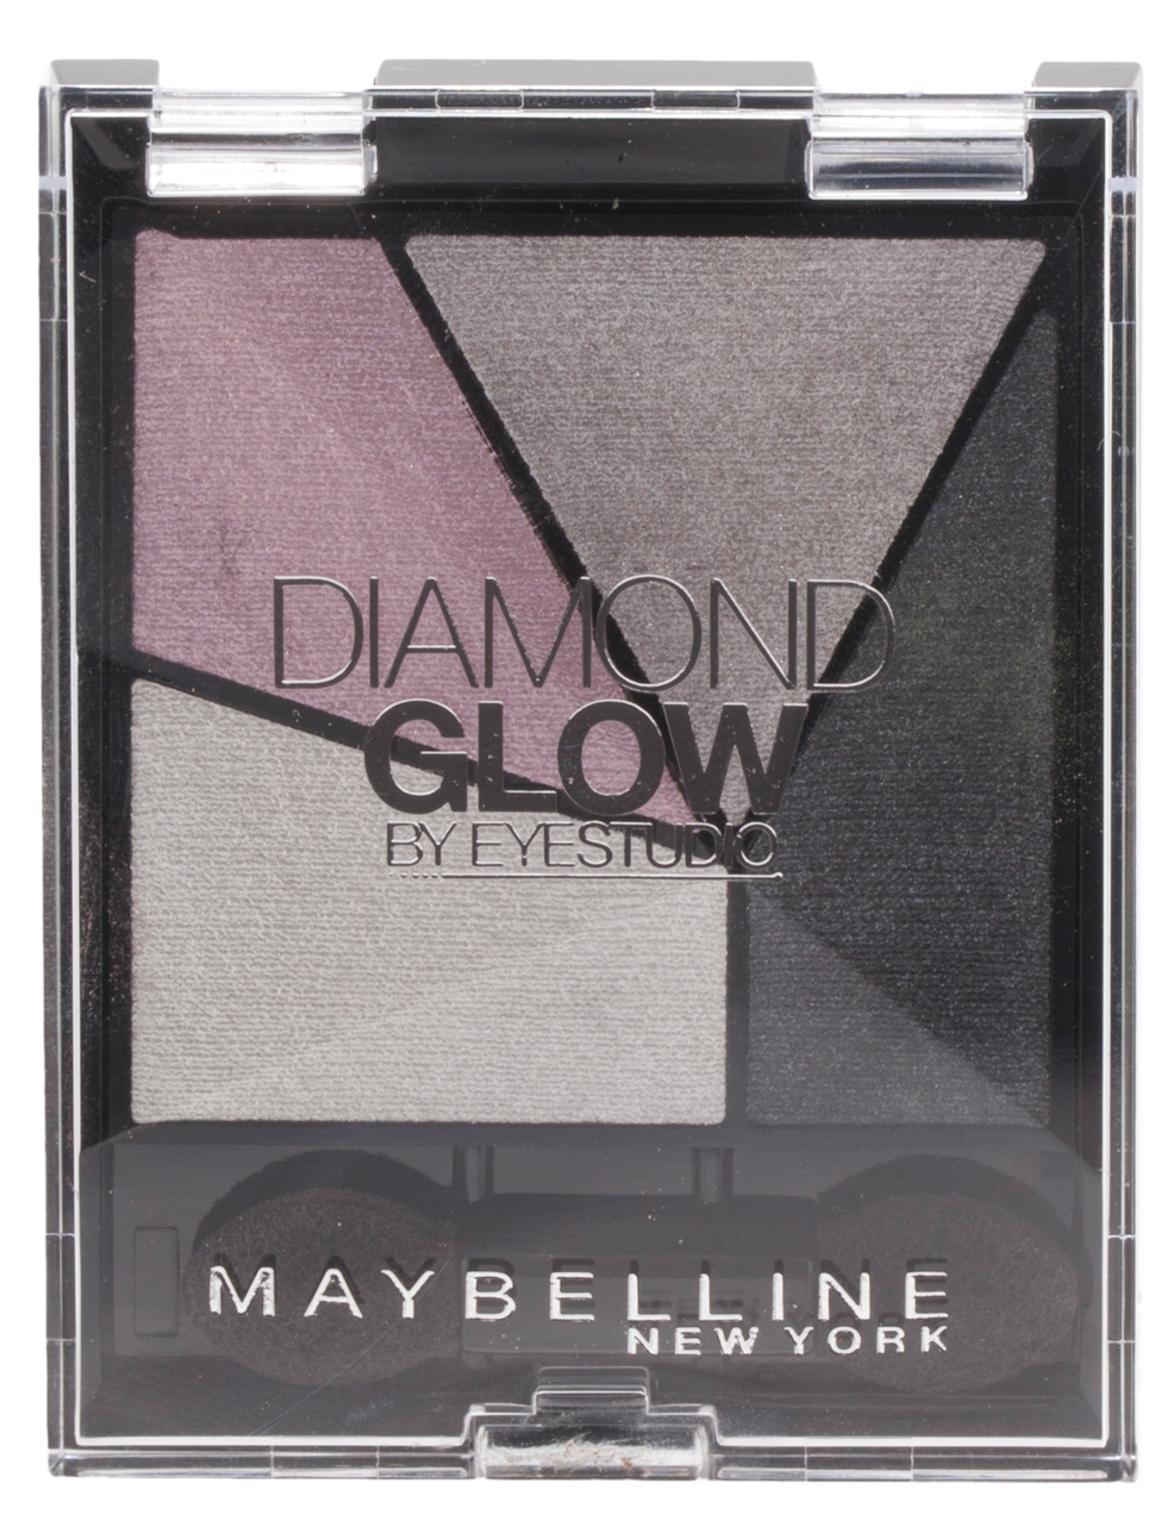 Maybelline Diamond Glow Pearl Quad Eye Shadow -  04 Grey Pink Drama